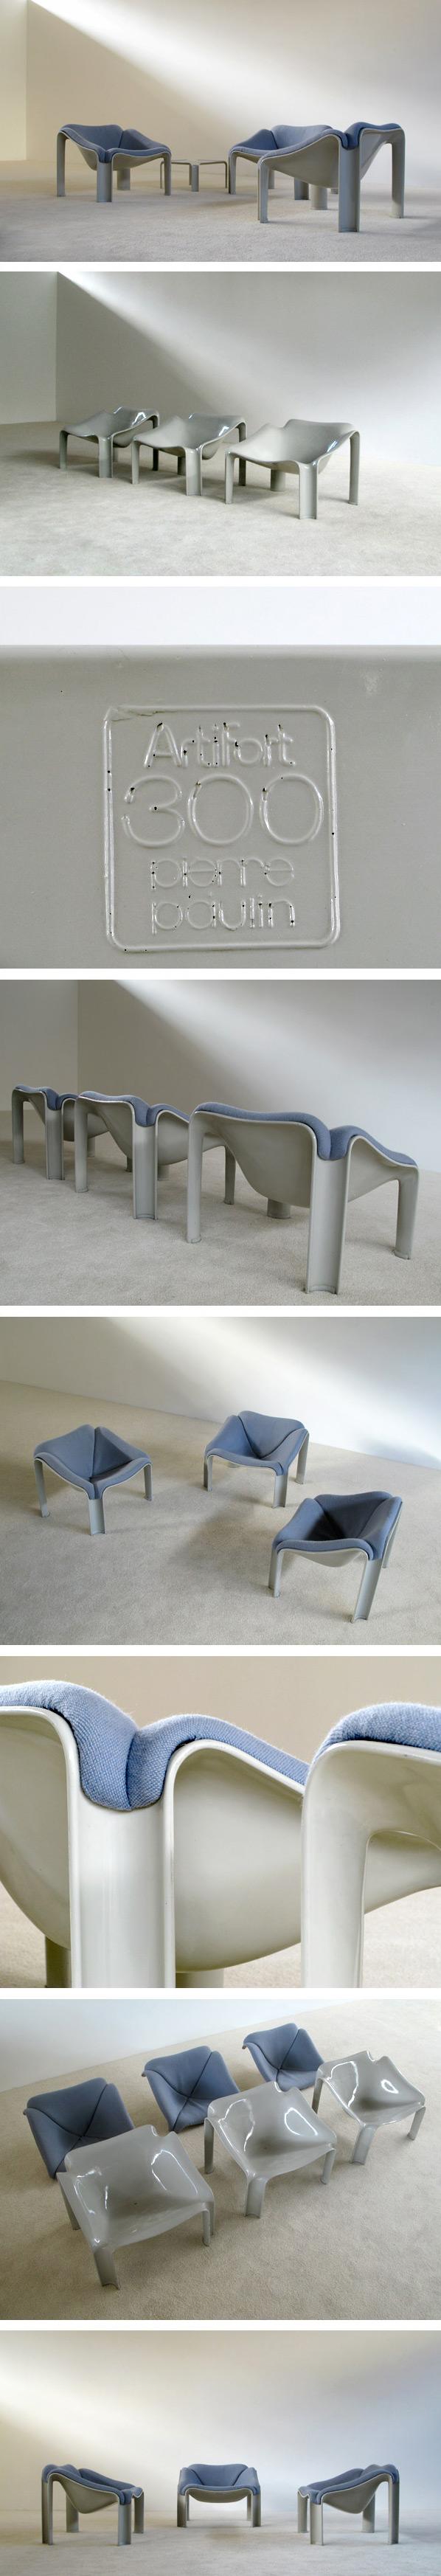 3 chairs F300 series Pierre Paulin Artifort Large